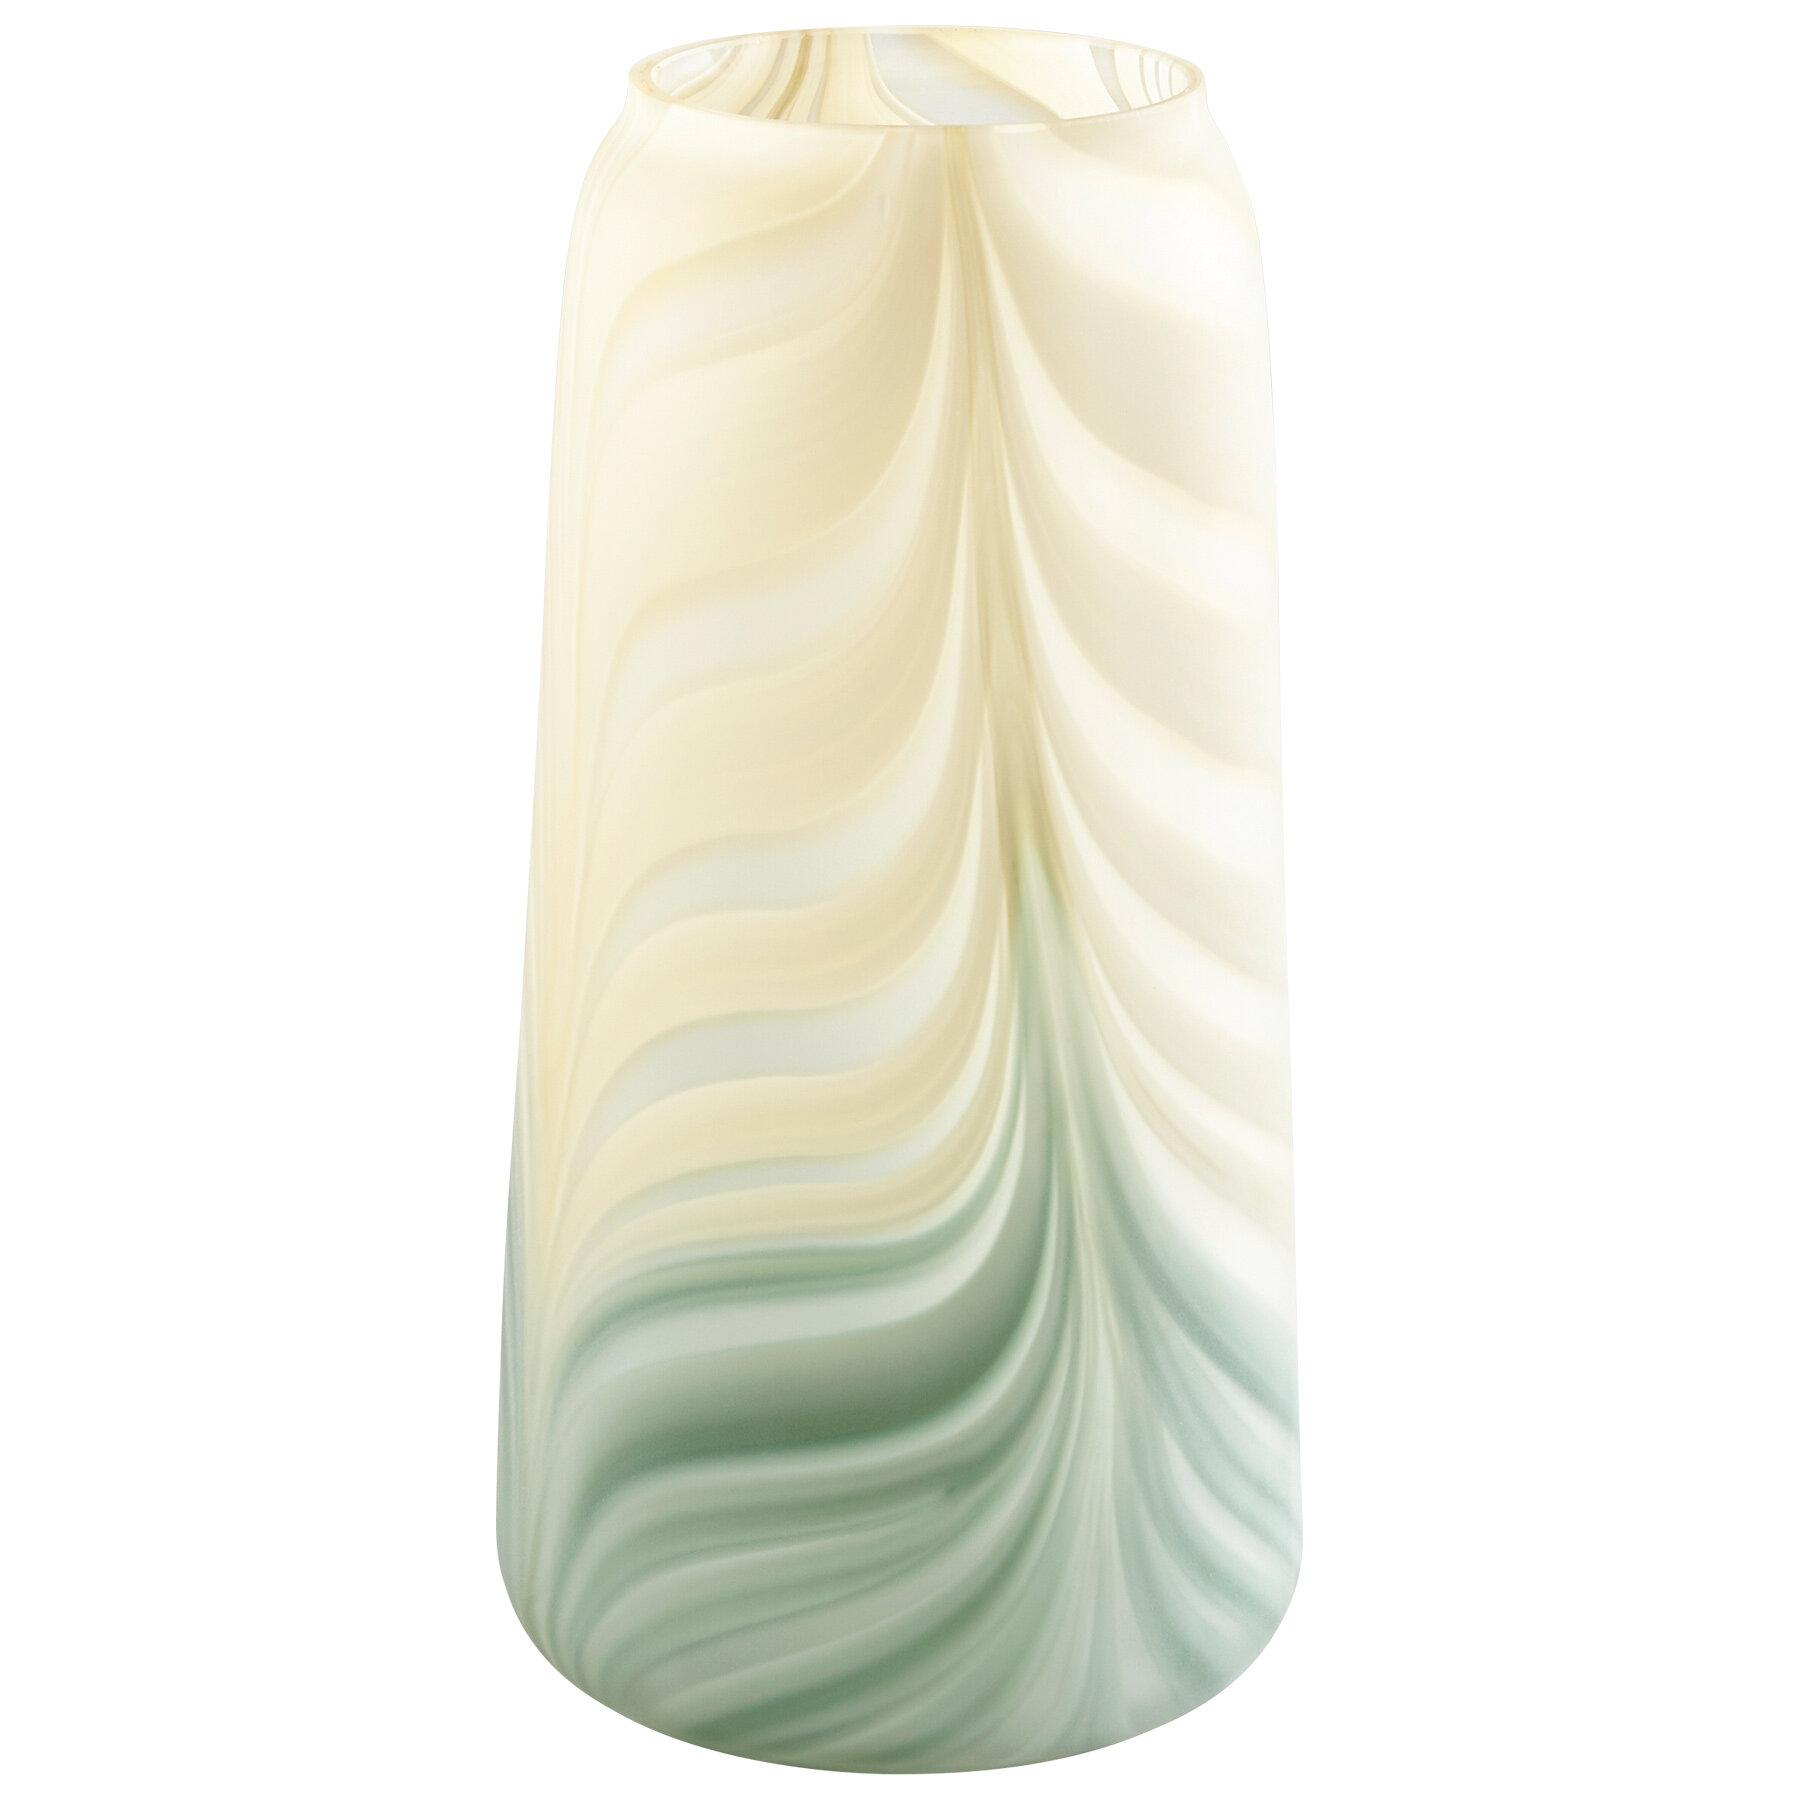 Cyan Design Yellow Green Glass Table Vase Reviews Perigold